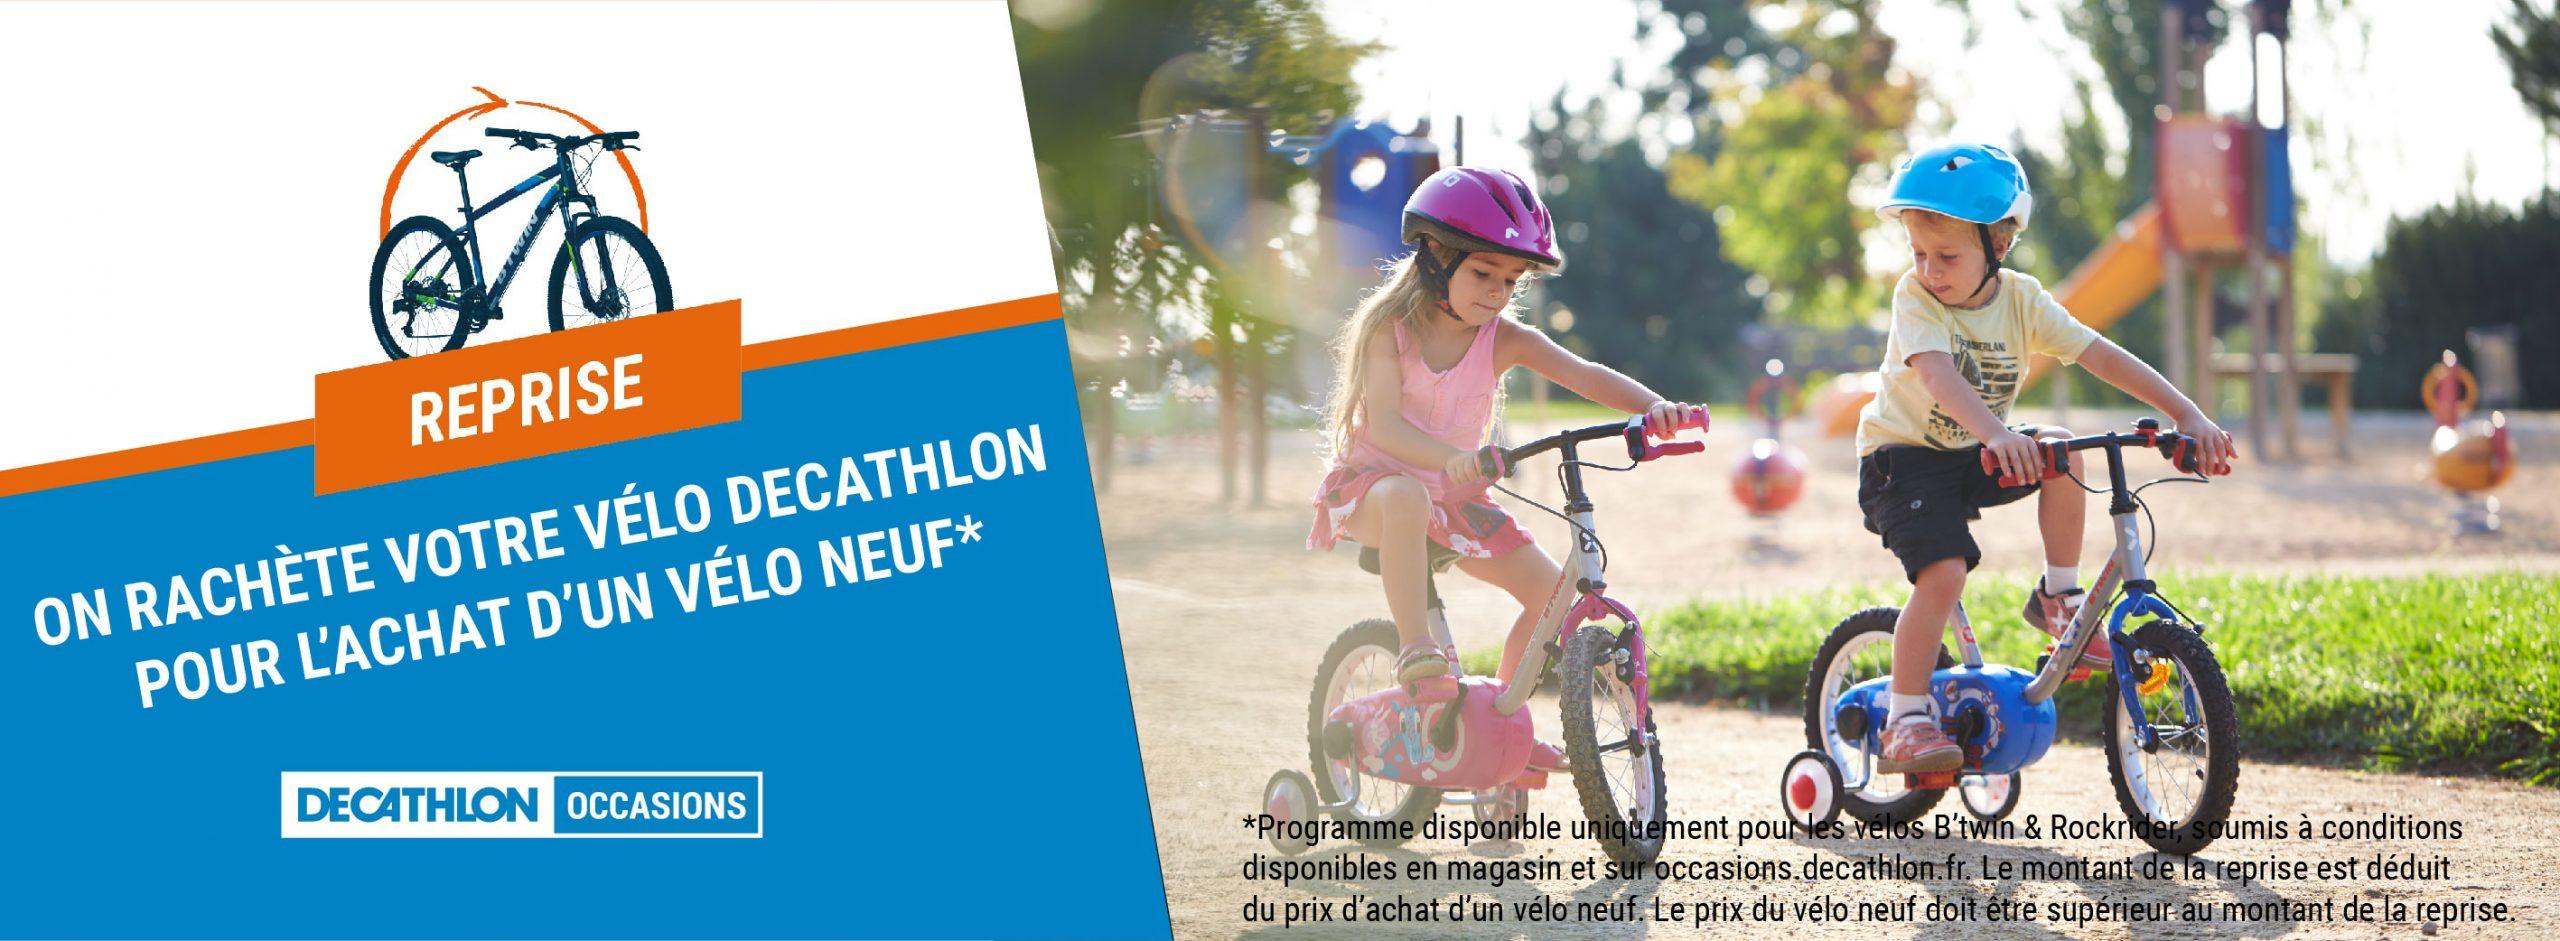 Magasin De Sport Decathlon Chambourcy dedans Velo Piscine Decathlon